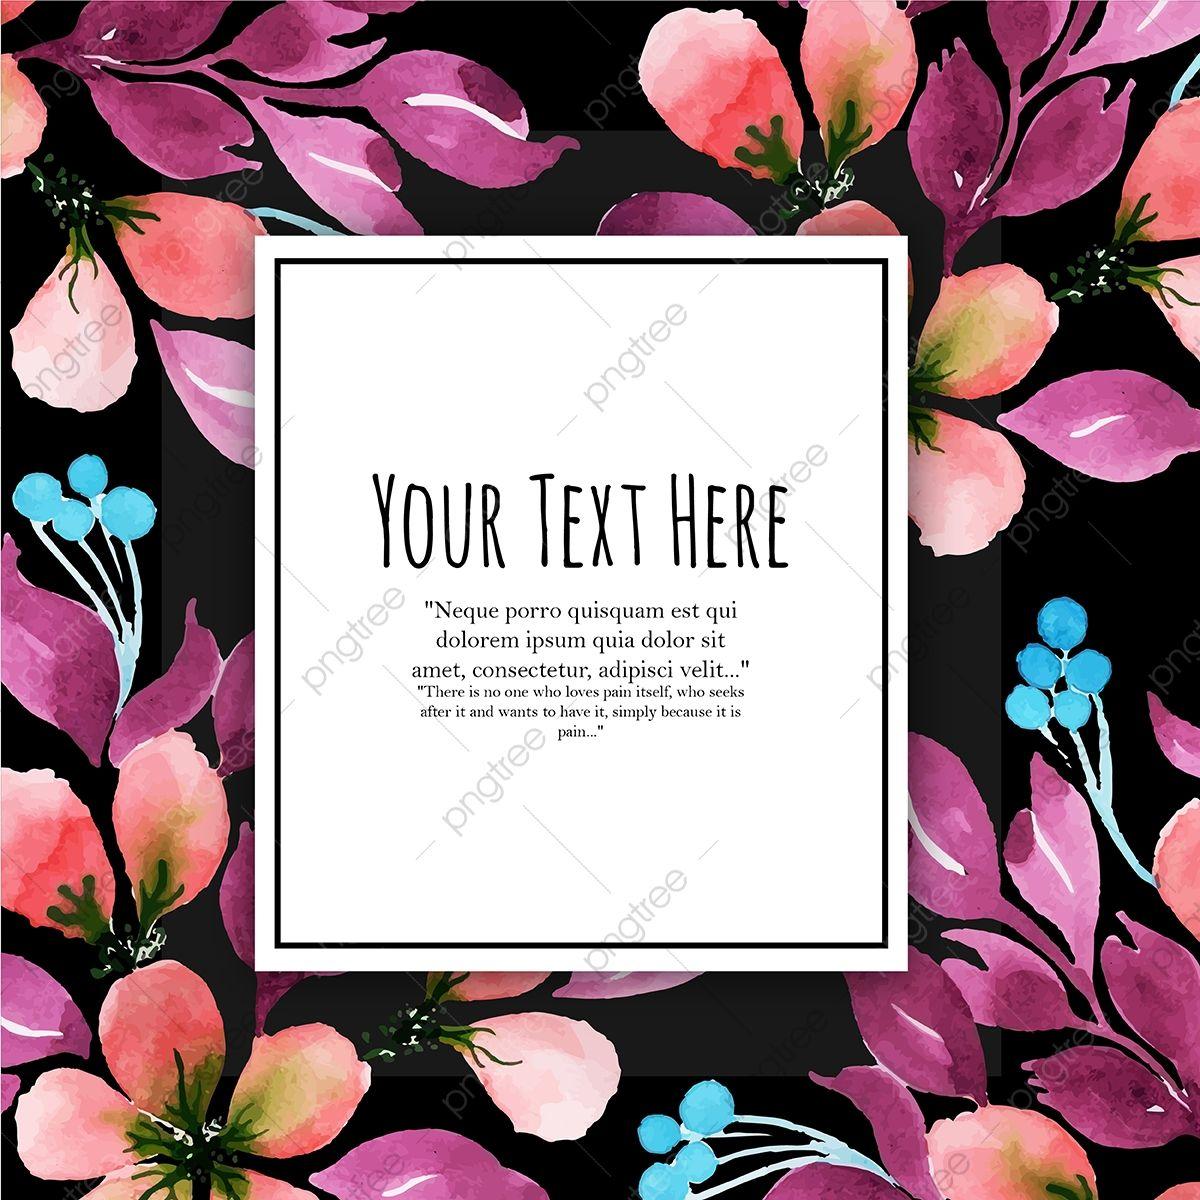 Gambar Hari Jadi Cat Air Bunga Kad Jemputan Serbaguna Latar Belakang Untuk Ulang Tahun Dan Lain Lain Perayaan Pernikahan Ulang Tahun Latar Belakang Latar Bel Watercolor Floral Invitation Floral Invitation Invitation